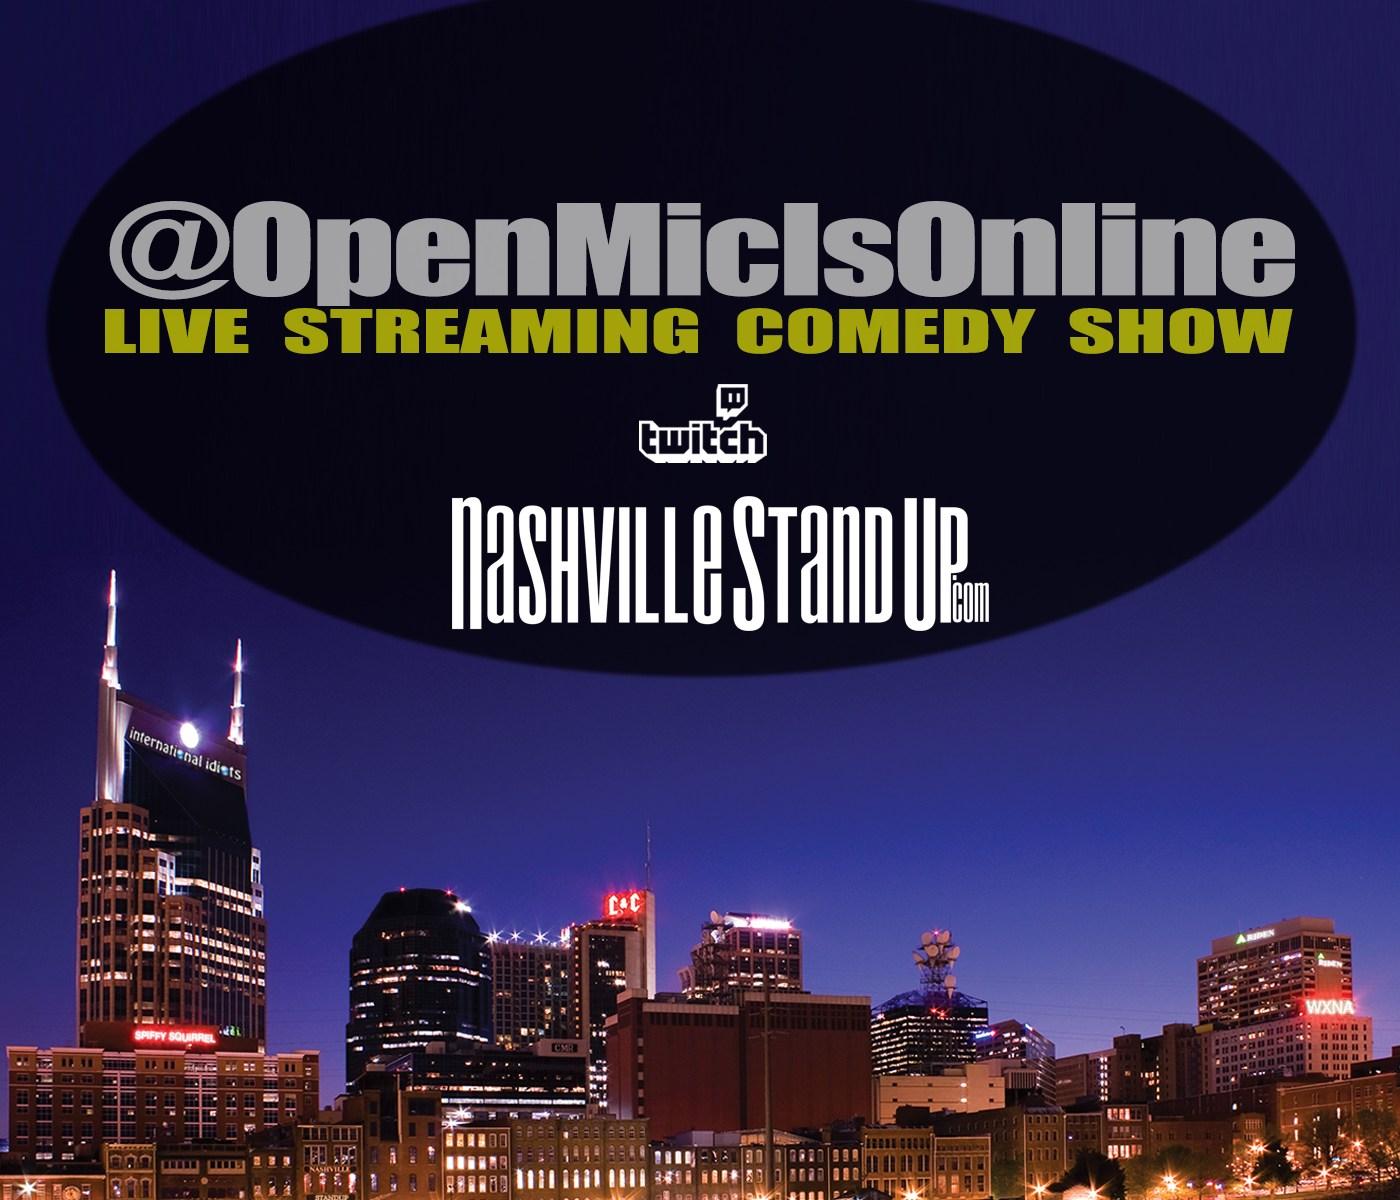 @OpenMicIsOnline